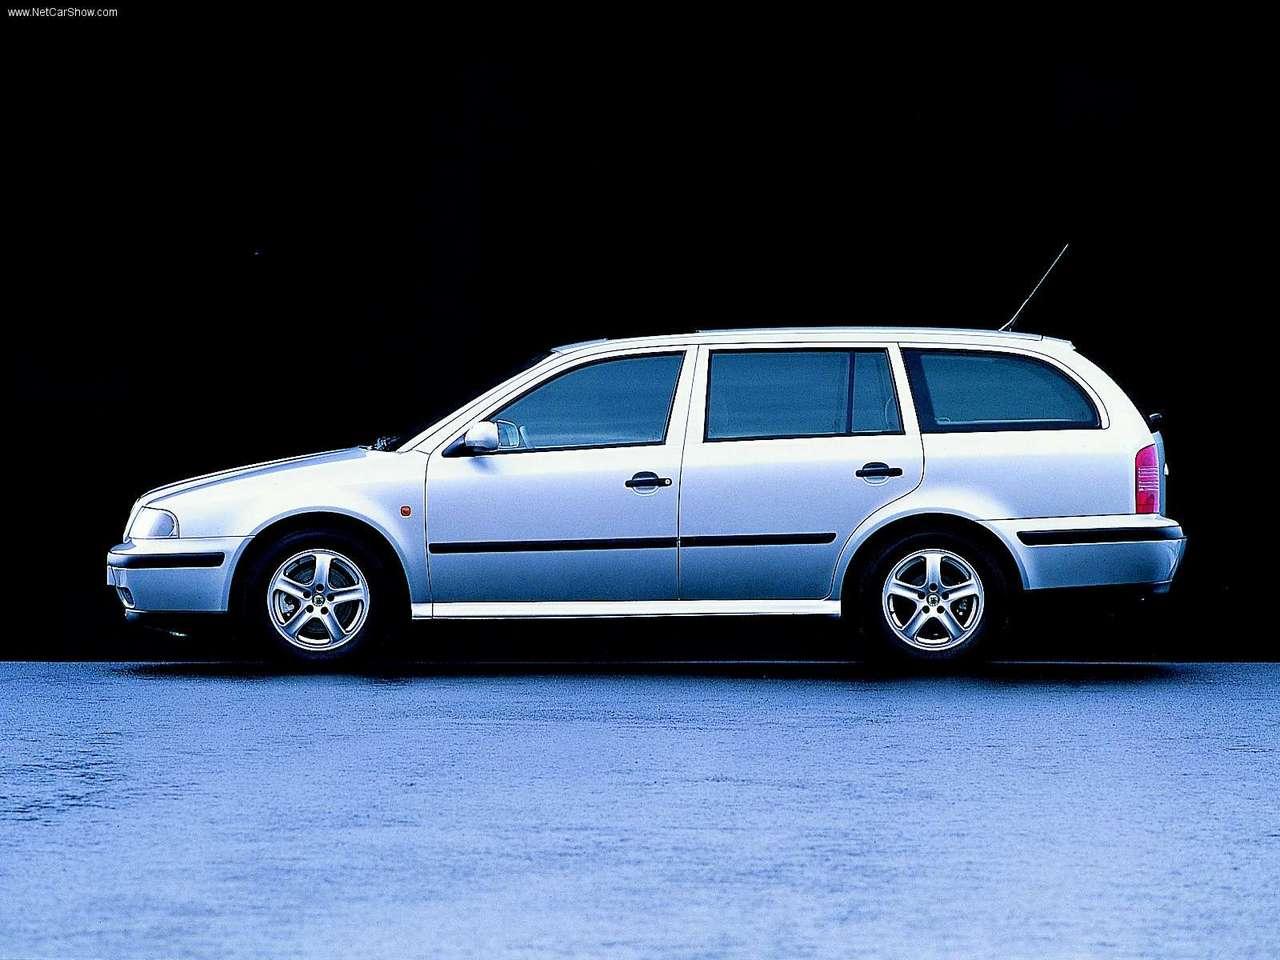 1999 skoda octavia combi skoda cars. Black Bedroom Furniture Sets. Home Design Ideas